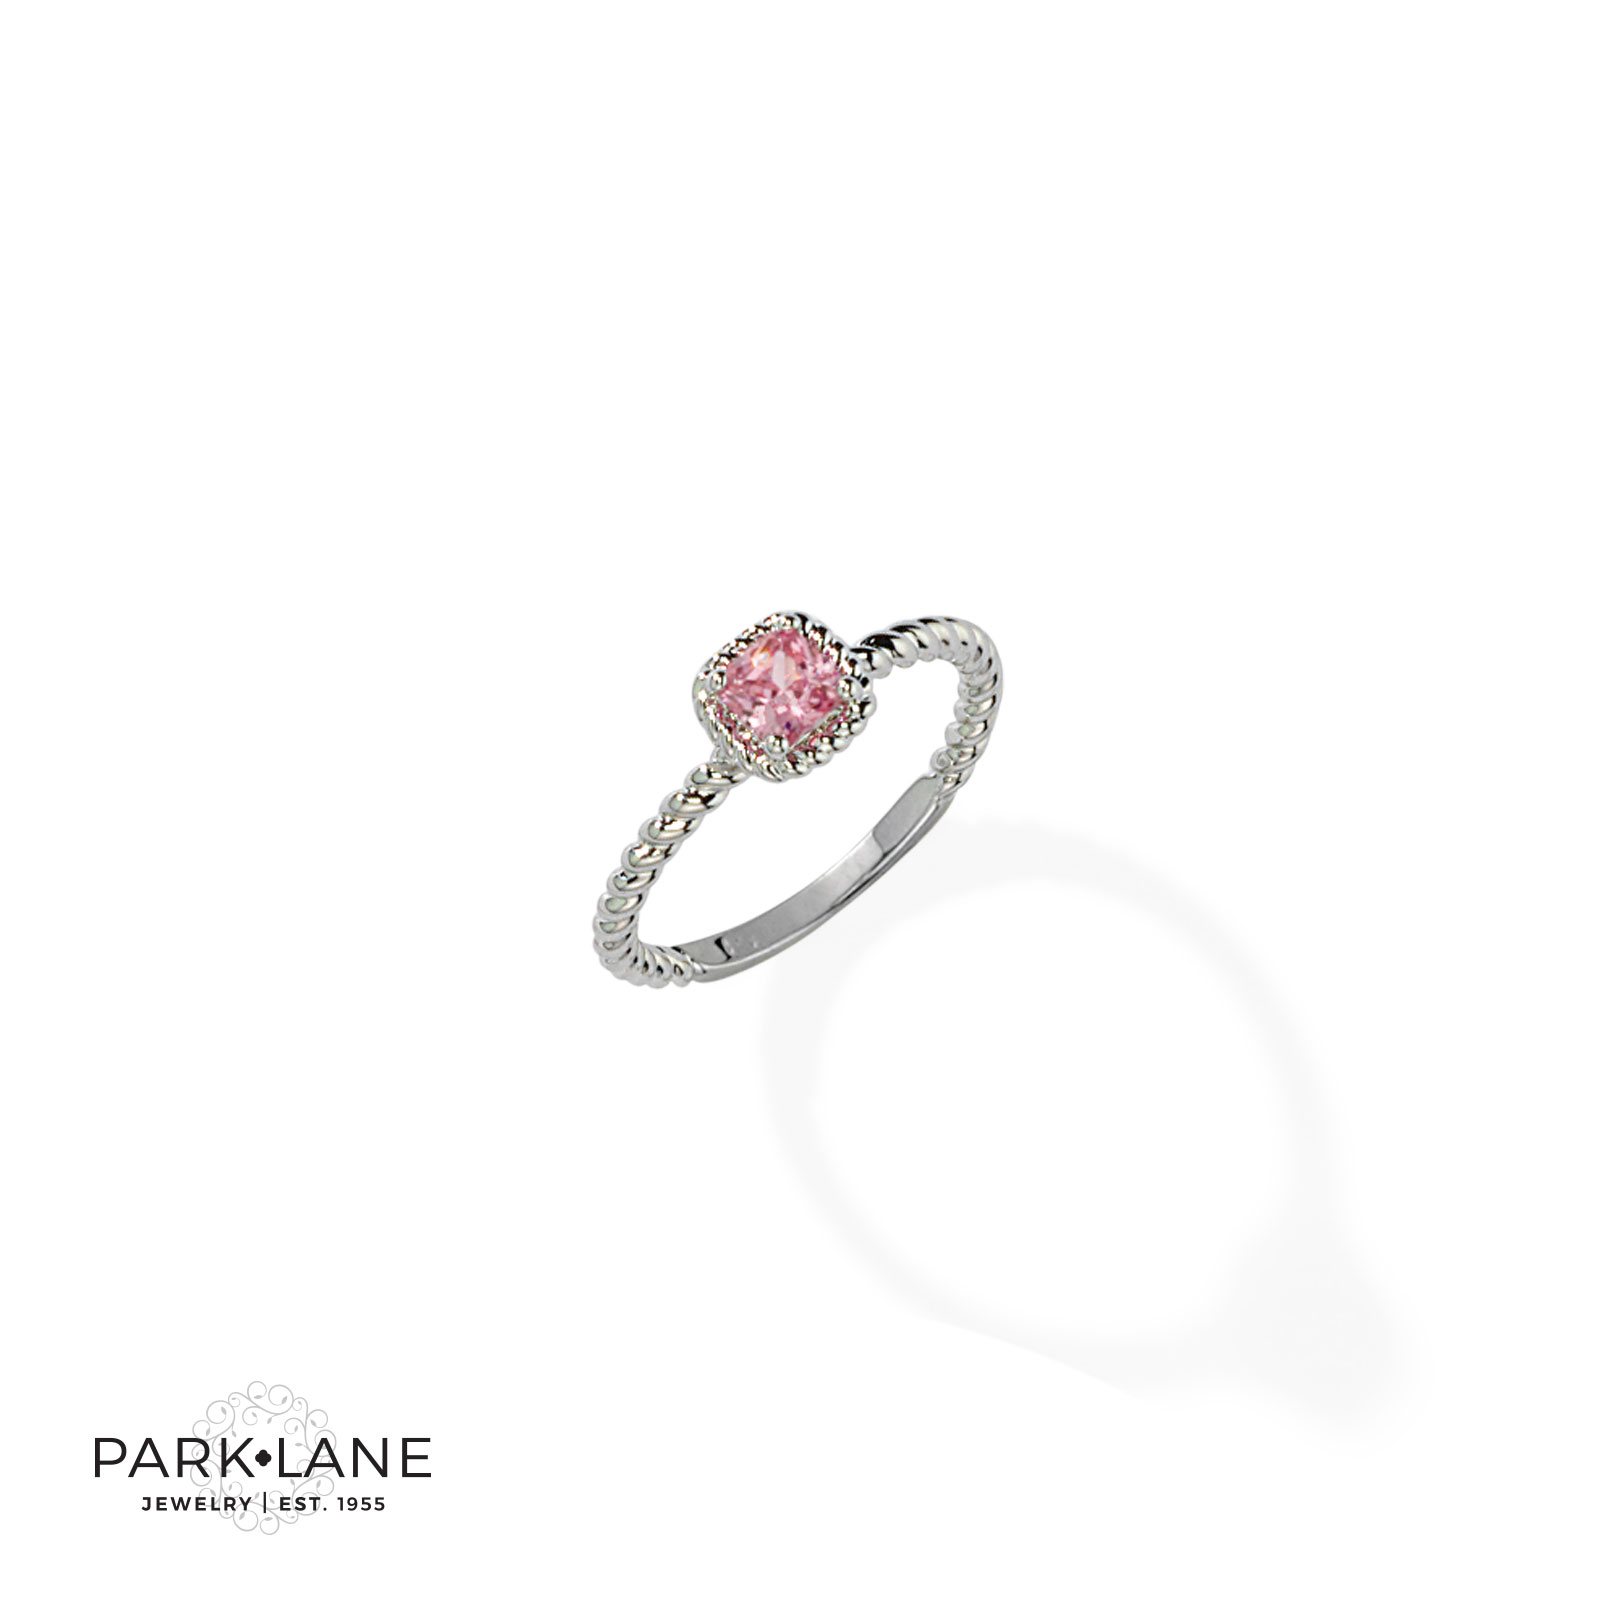 park lane jewelry caress ring